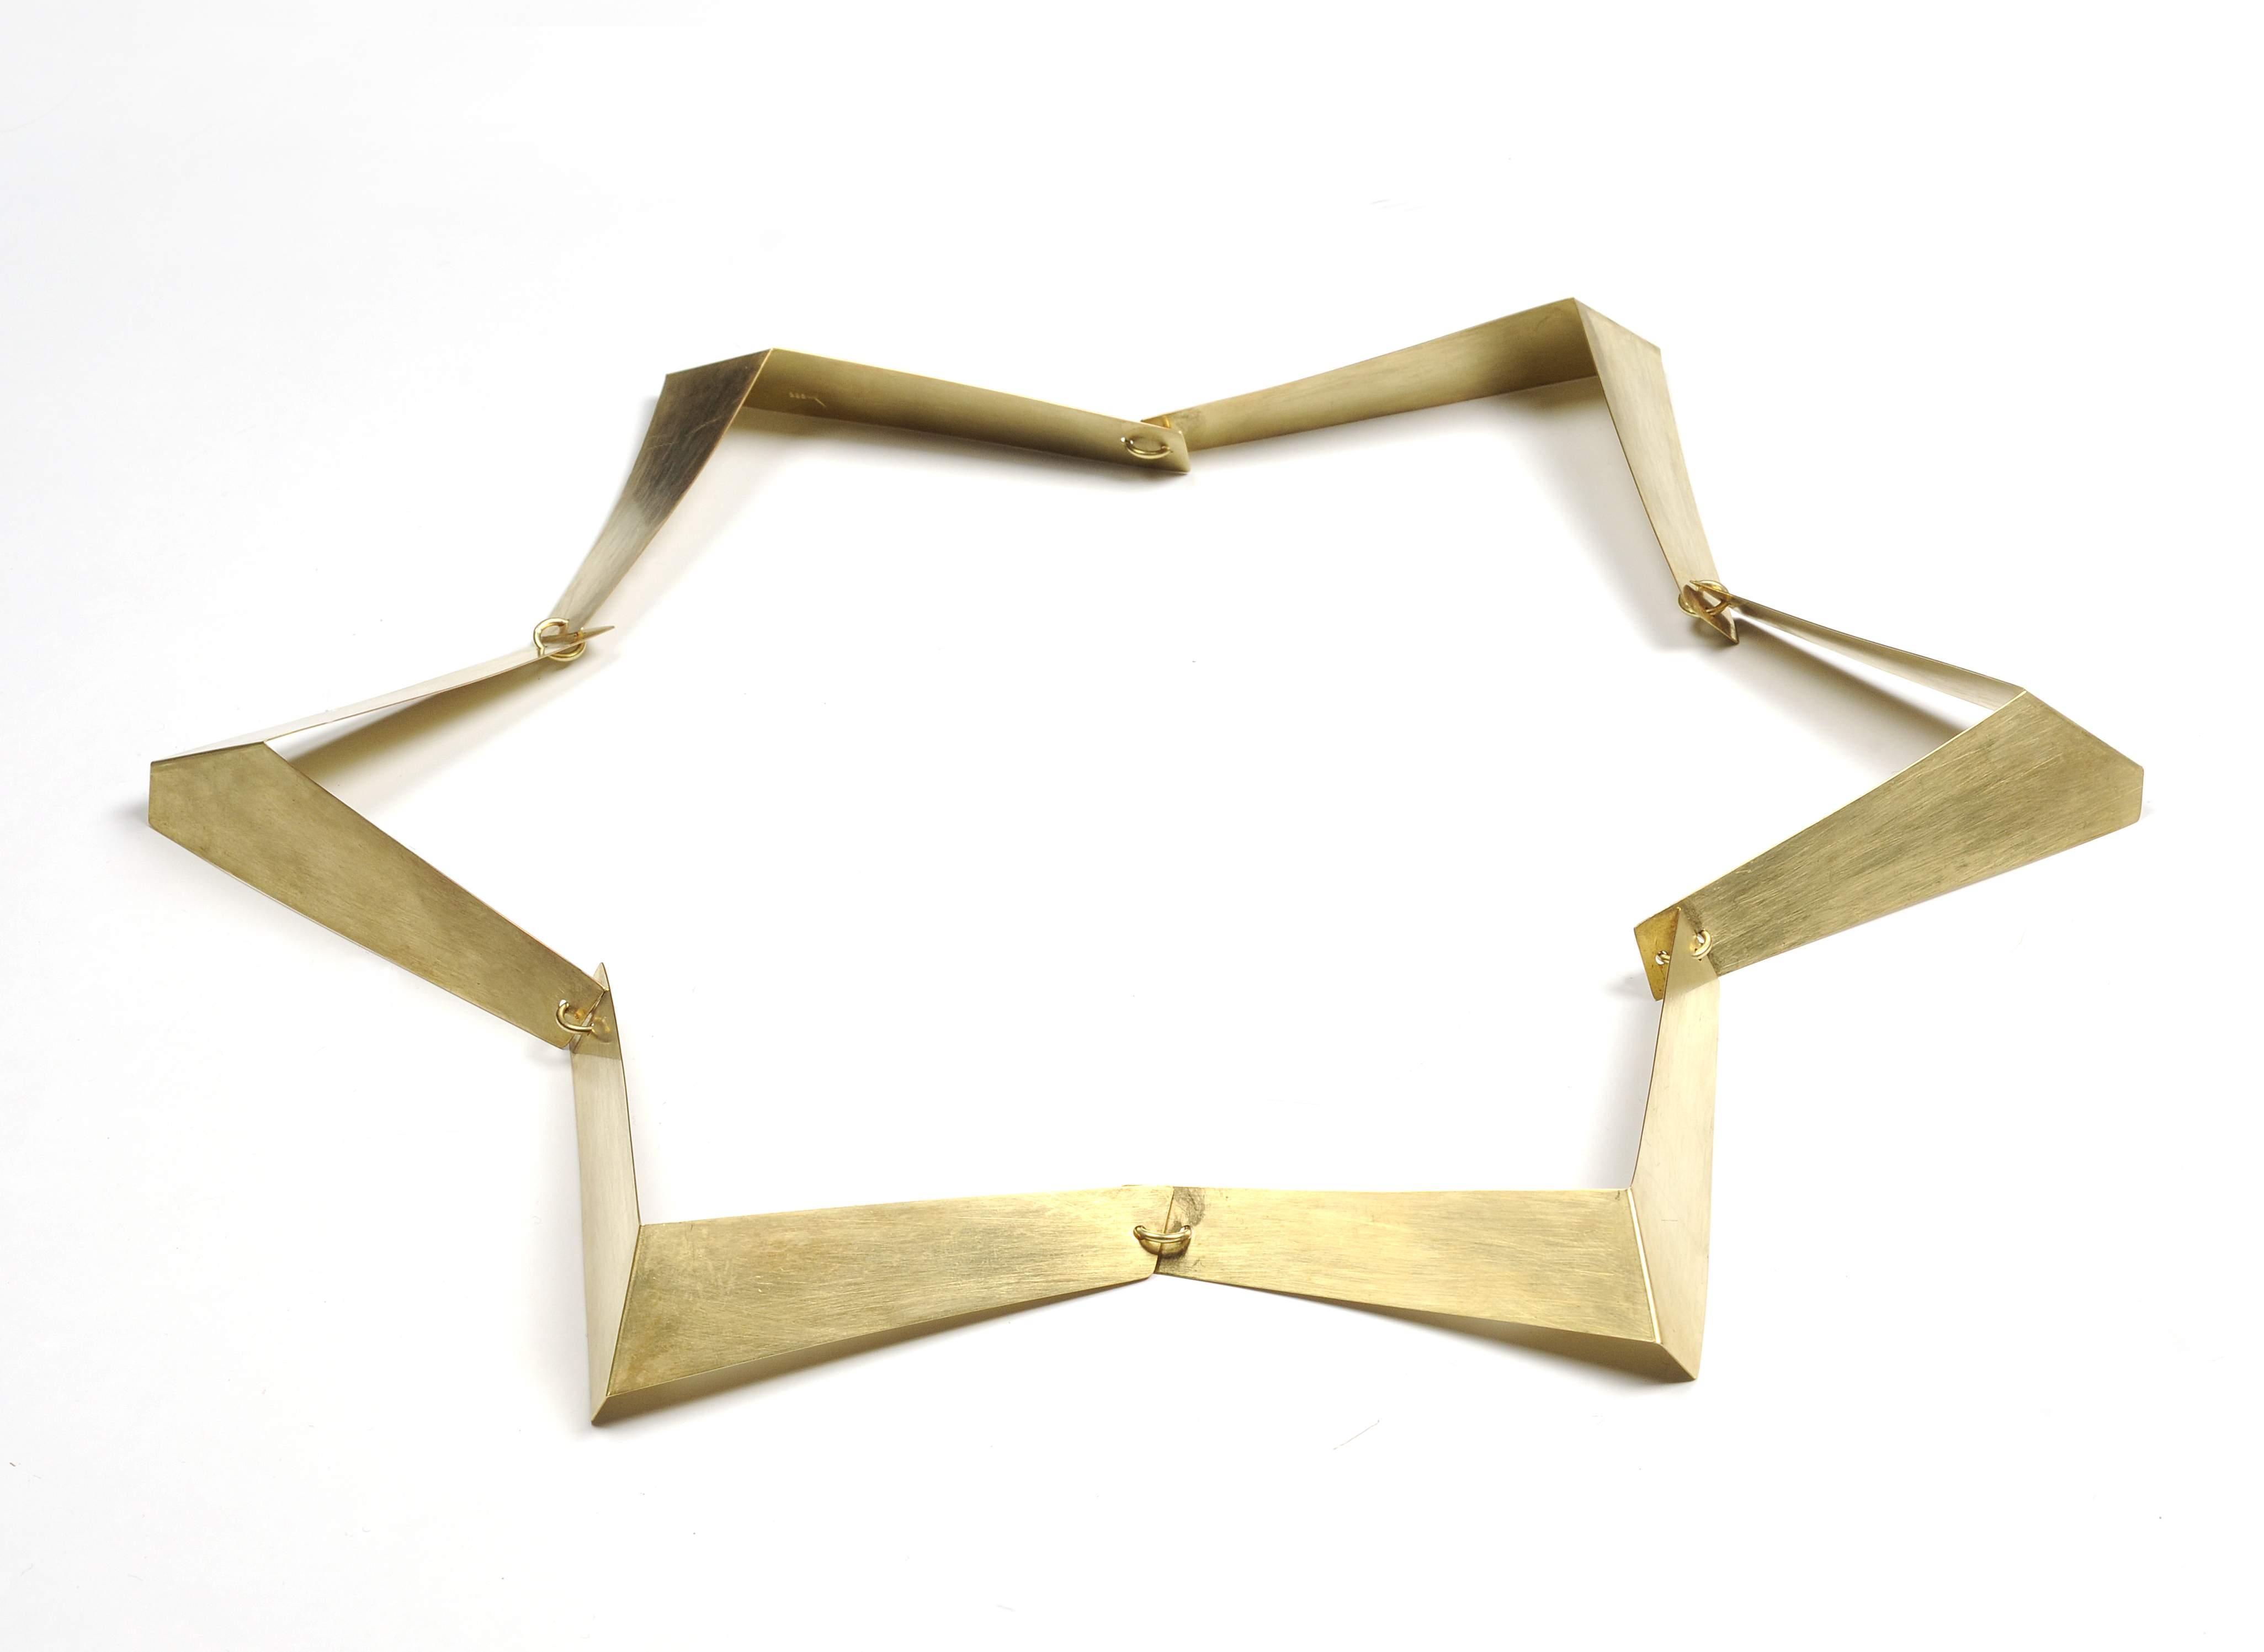 Dorothea Prühl, Zickzack, halssieraad, 1999. Collectie CODA, goud